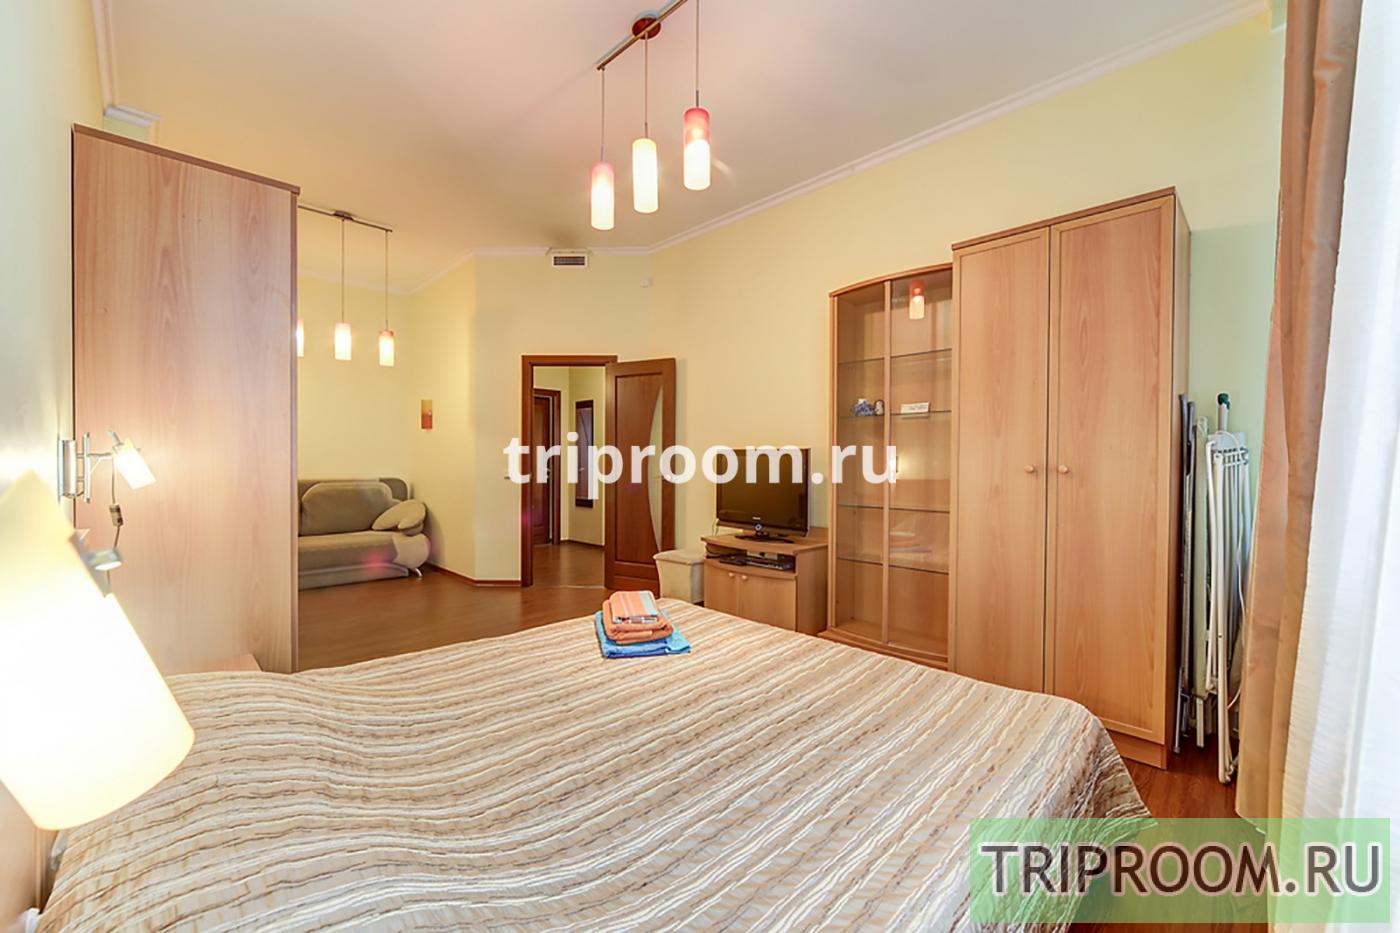 1-комнатная квартира посуточно (вариант № 15527), ул. Канала Грибоедова набережная, фото № 10